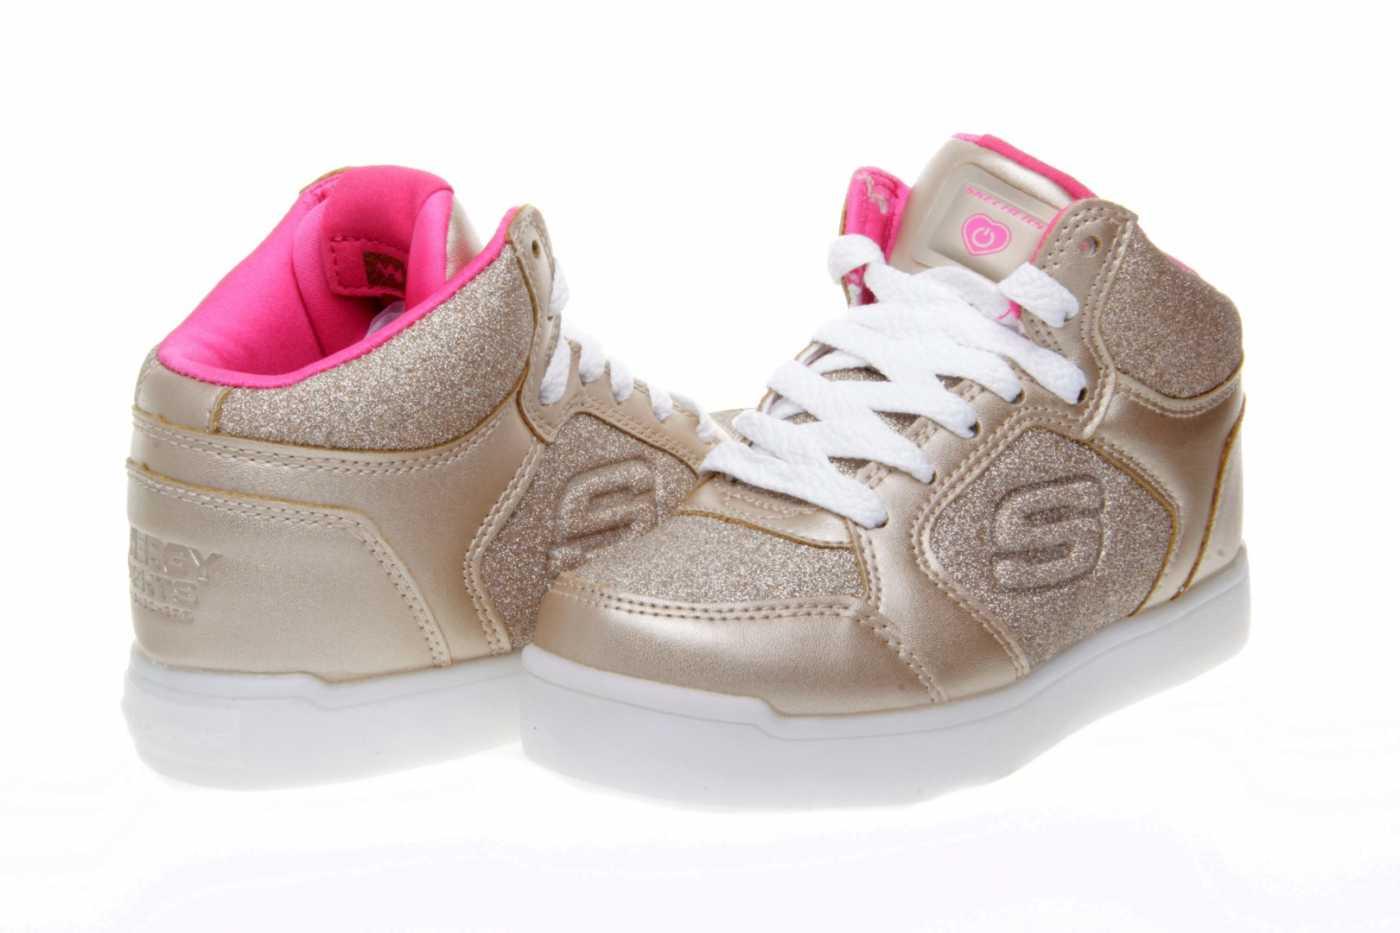 sacerdote antártico insecto  Comprar zapato SKECHERS para JOVEN NIÑA estilo BOTAS color ORO METALIZADO